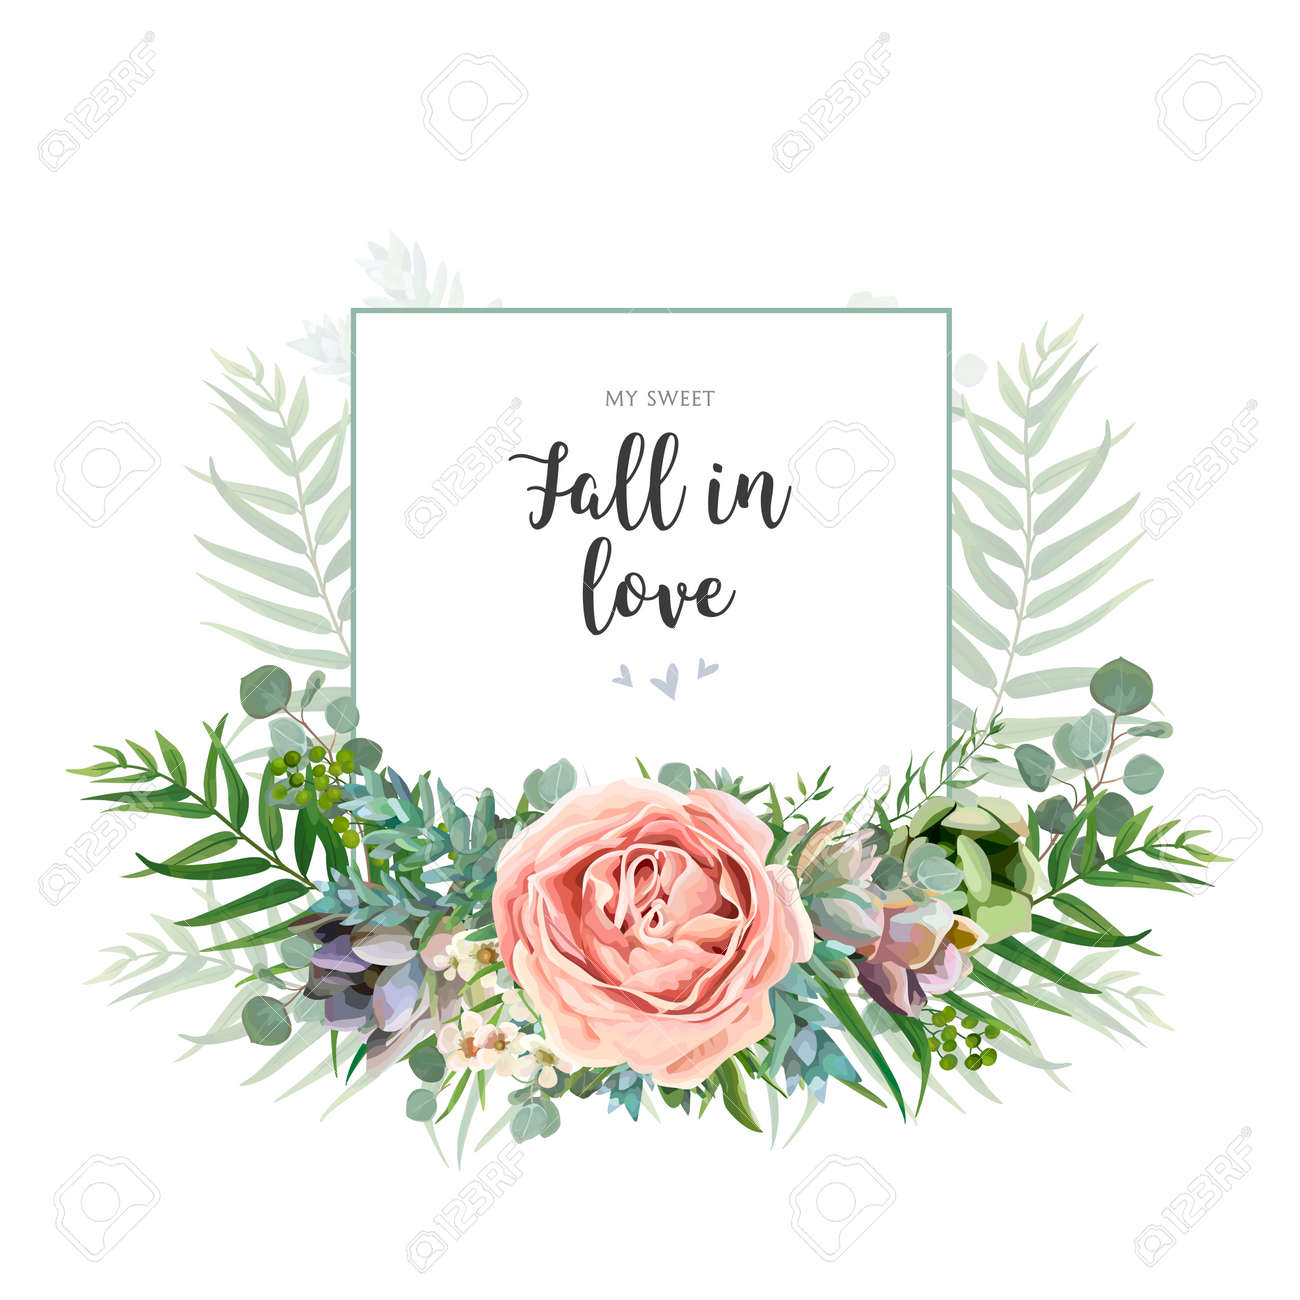 Floral invite greeting postcard card design. Garden pink Rose wax flower, Eucalyptus branch green palm leaves succulent bouquet watercolor wreath. Romantic art editable illustration. Text space. - 92867888